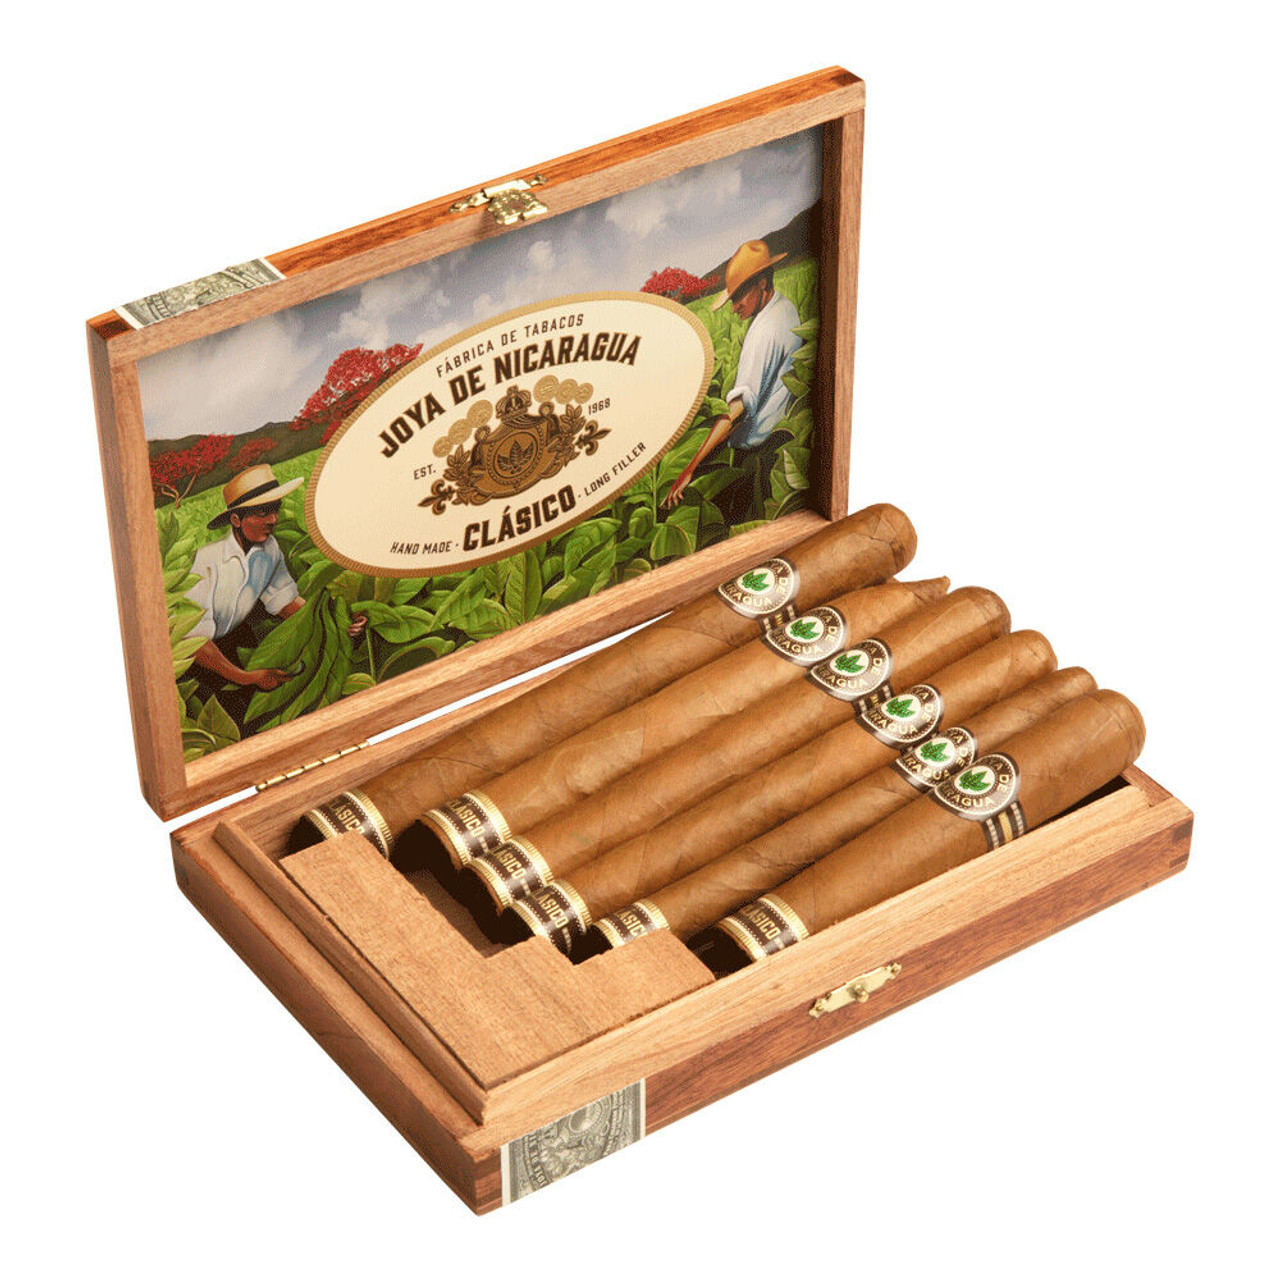 Cigar Samplers Joya de Nicaragua Clasico Tasting Sampler Cigars (Pack of 6)